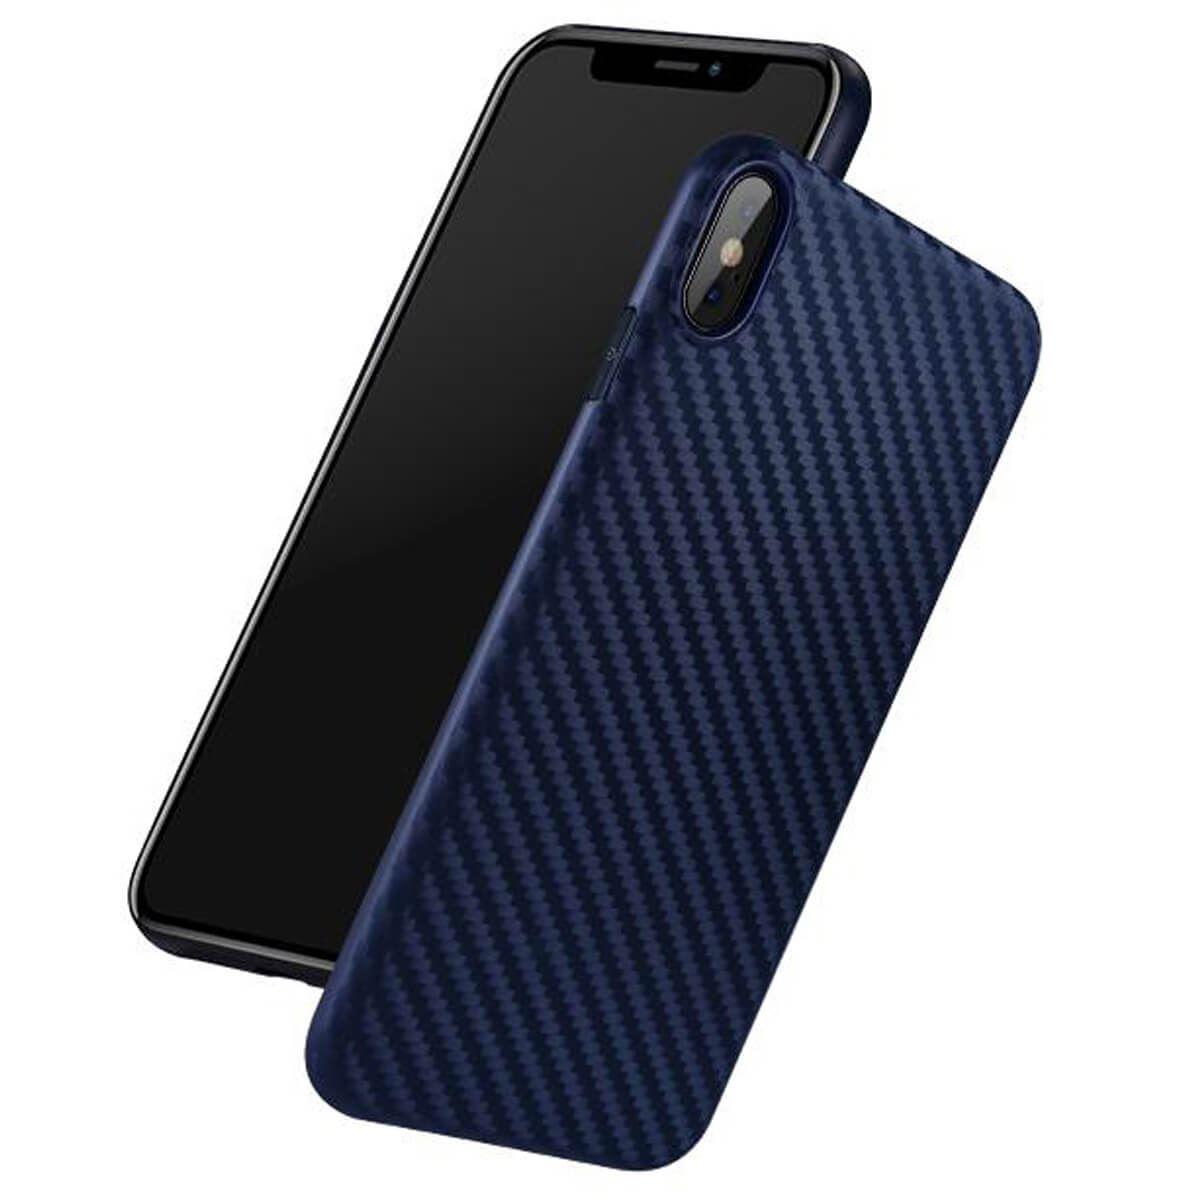 thumbnail 12 - Shockproof Carbon Fibre Case For Apple iPhone 10 X 8 Plus 7 6s Se 5 Thin Cover